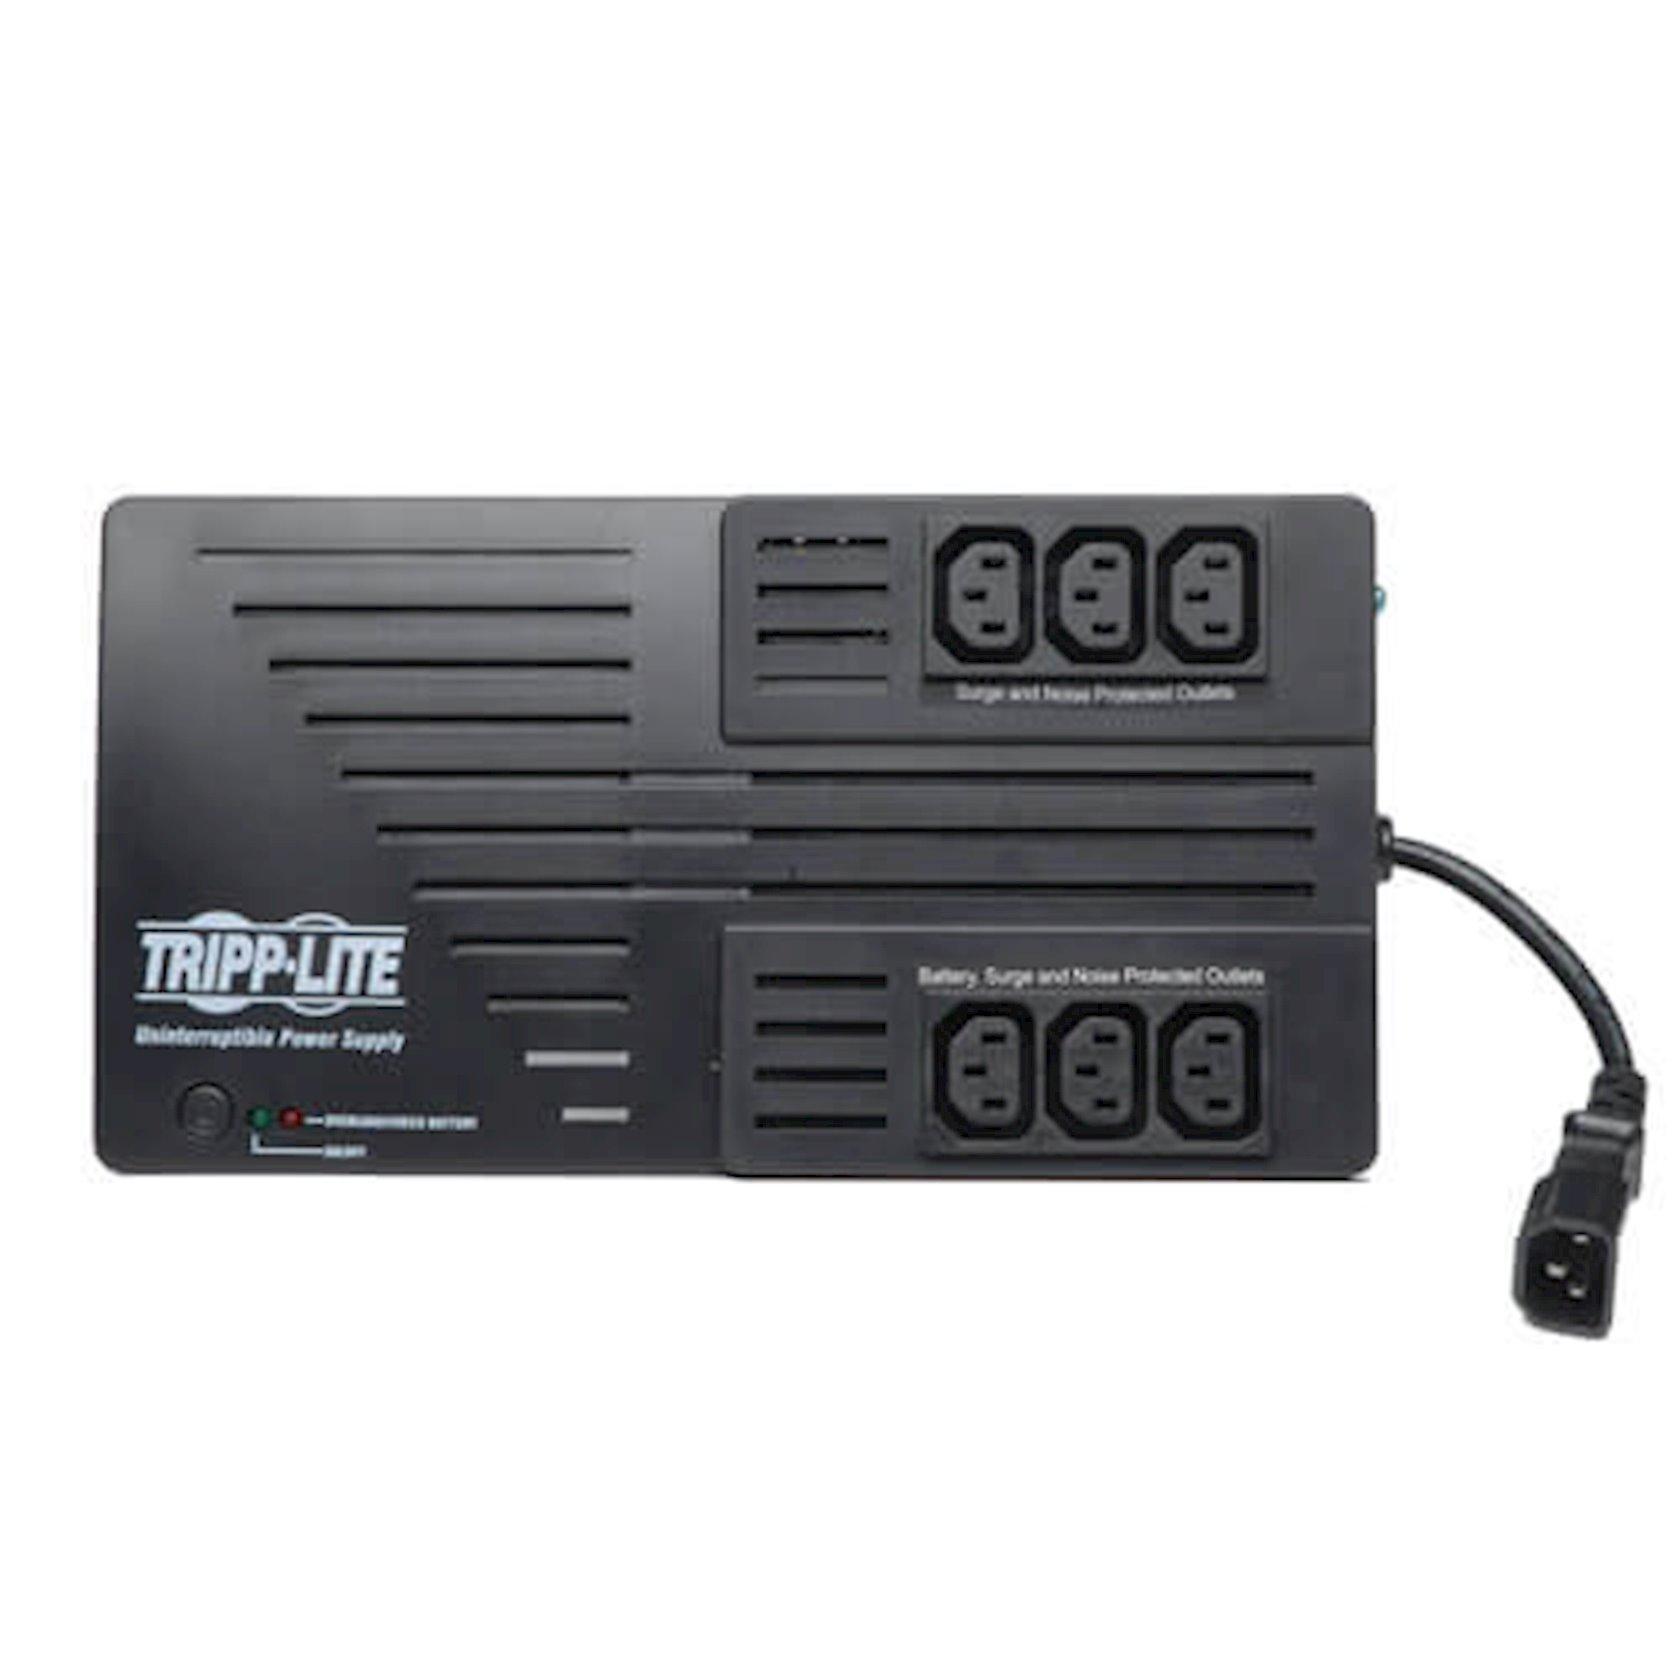 Ups Tripp Lite INTERNET AVR 550U